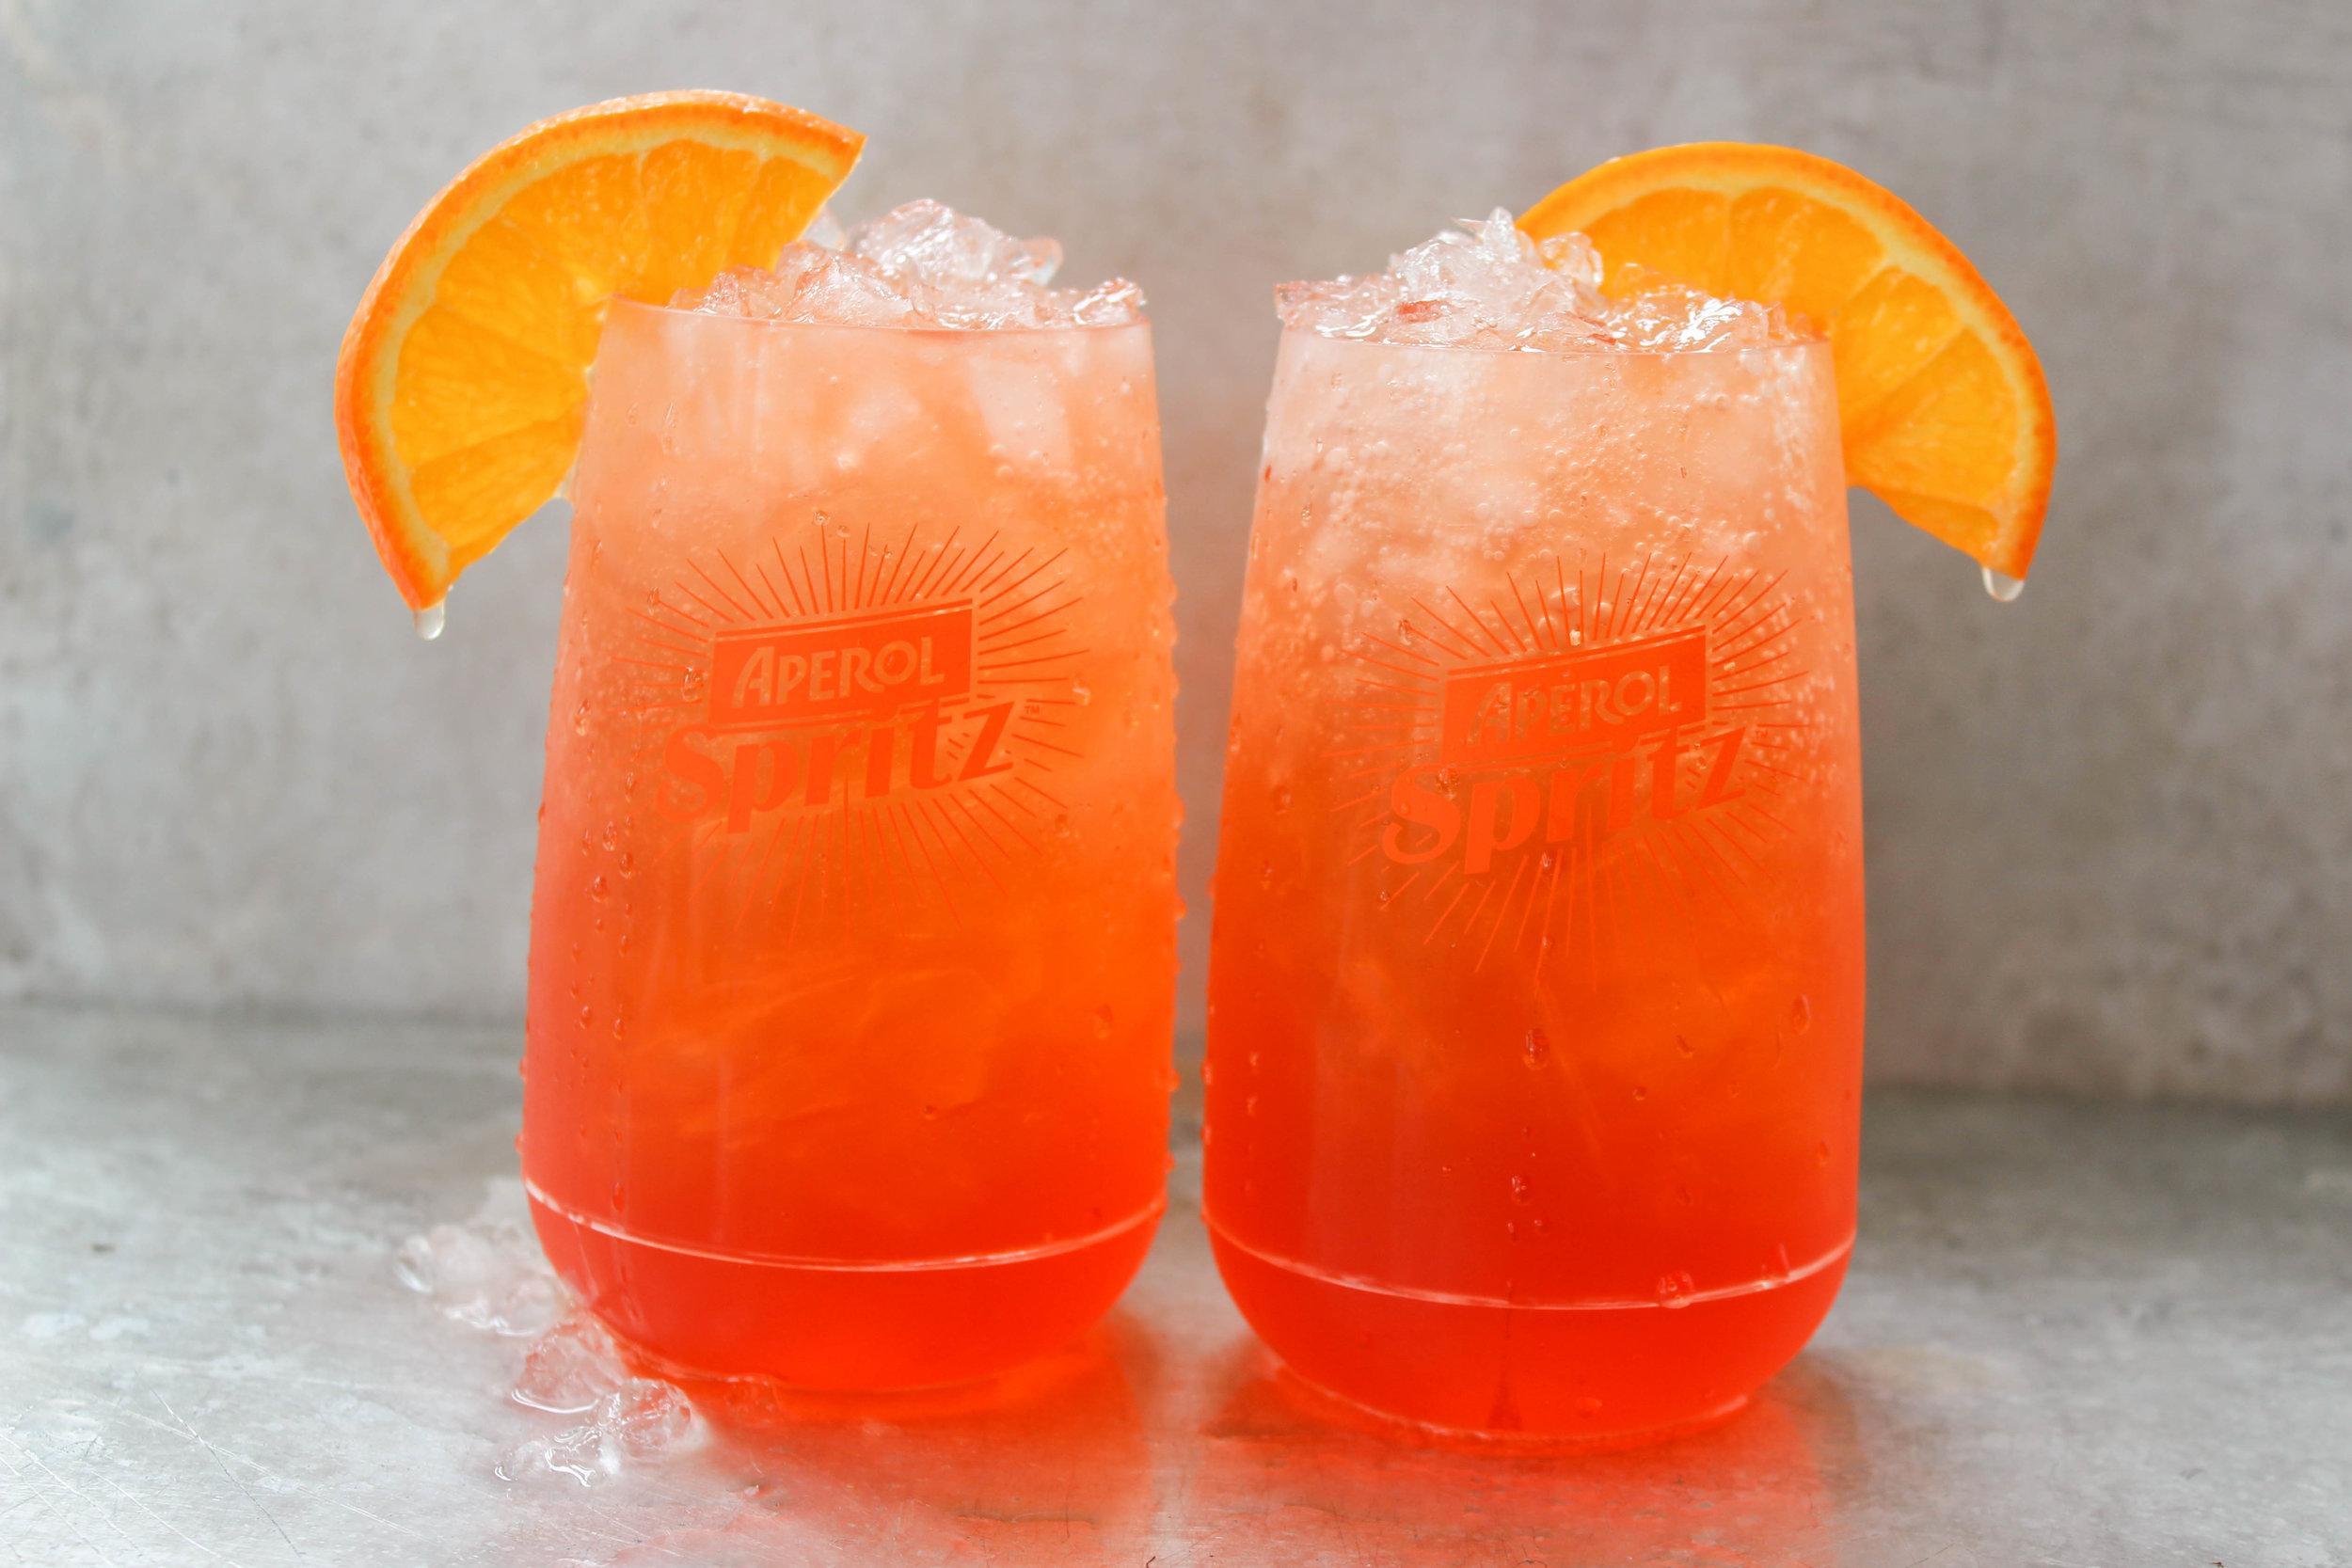 Aperol Spritz Cocktail - Photo: Beautiful Booze